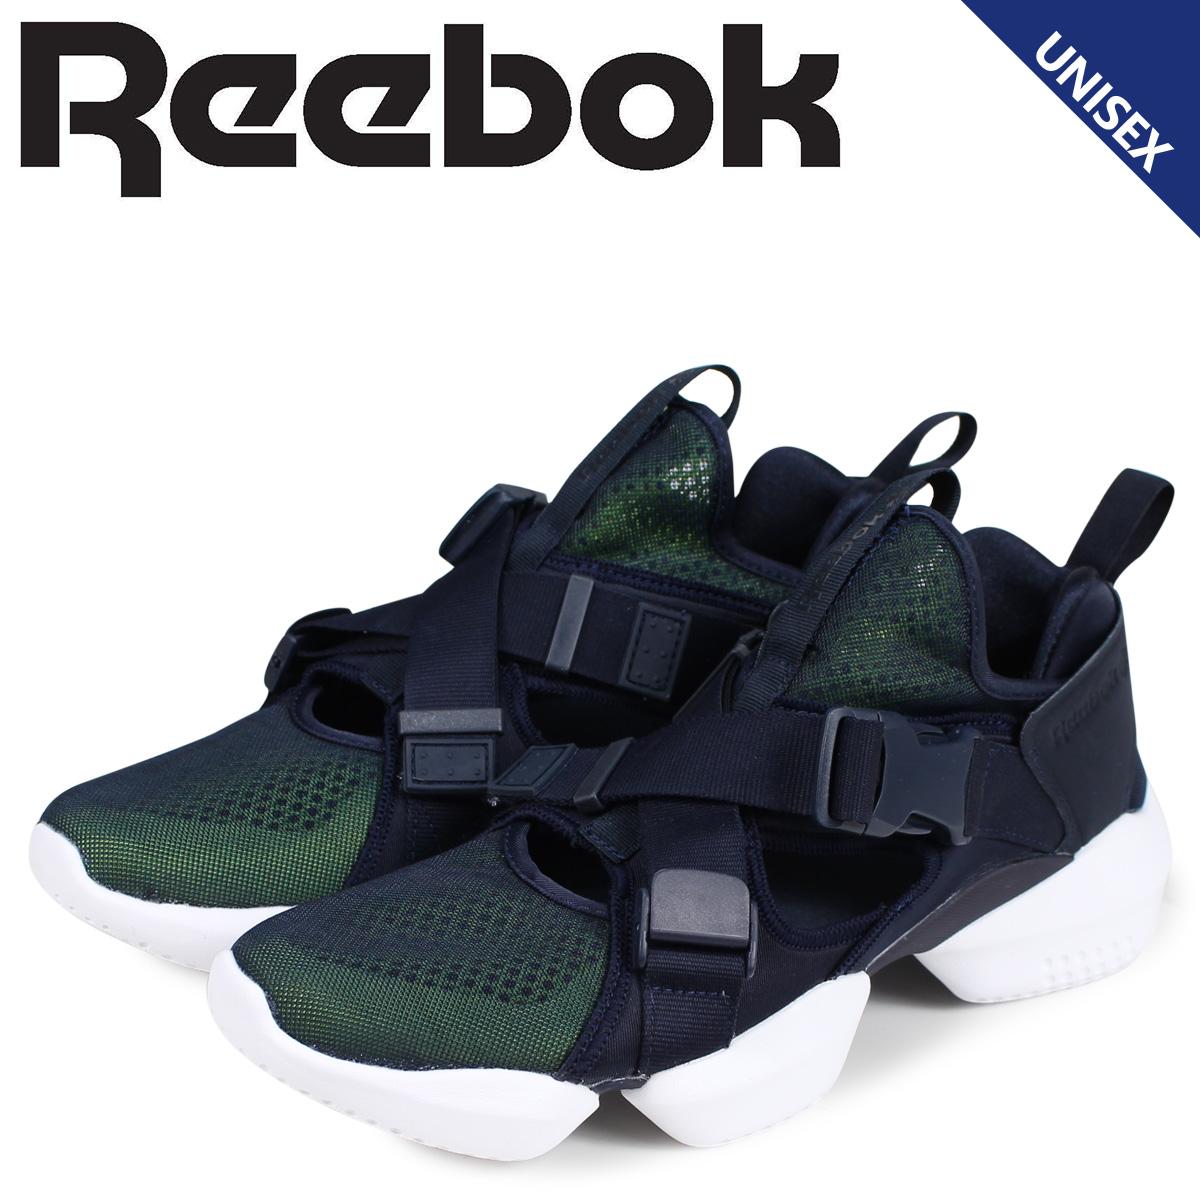 Reebok リーボック オーパス ストラップ スニーカー レディース メンズ 3D OP S-STRP ネイビー CN7916